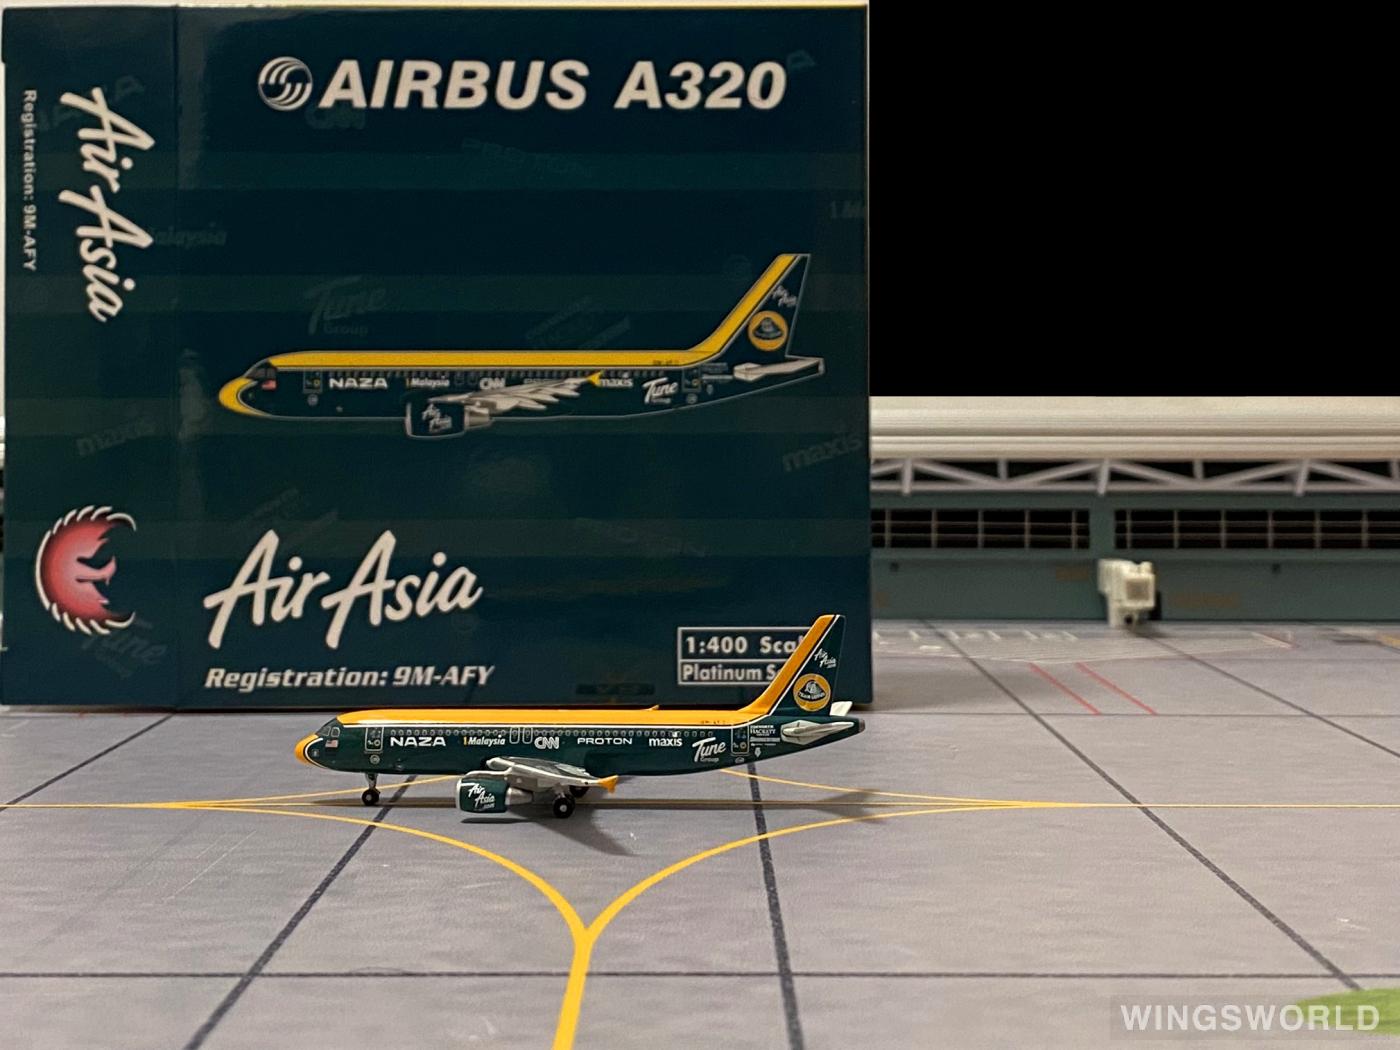 Phoenix 1:400 PH10547 AirAsia 亚洲航空 Airbus A320 9M-AFY